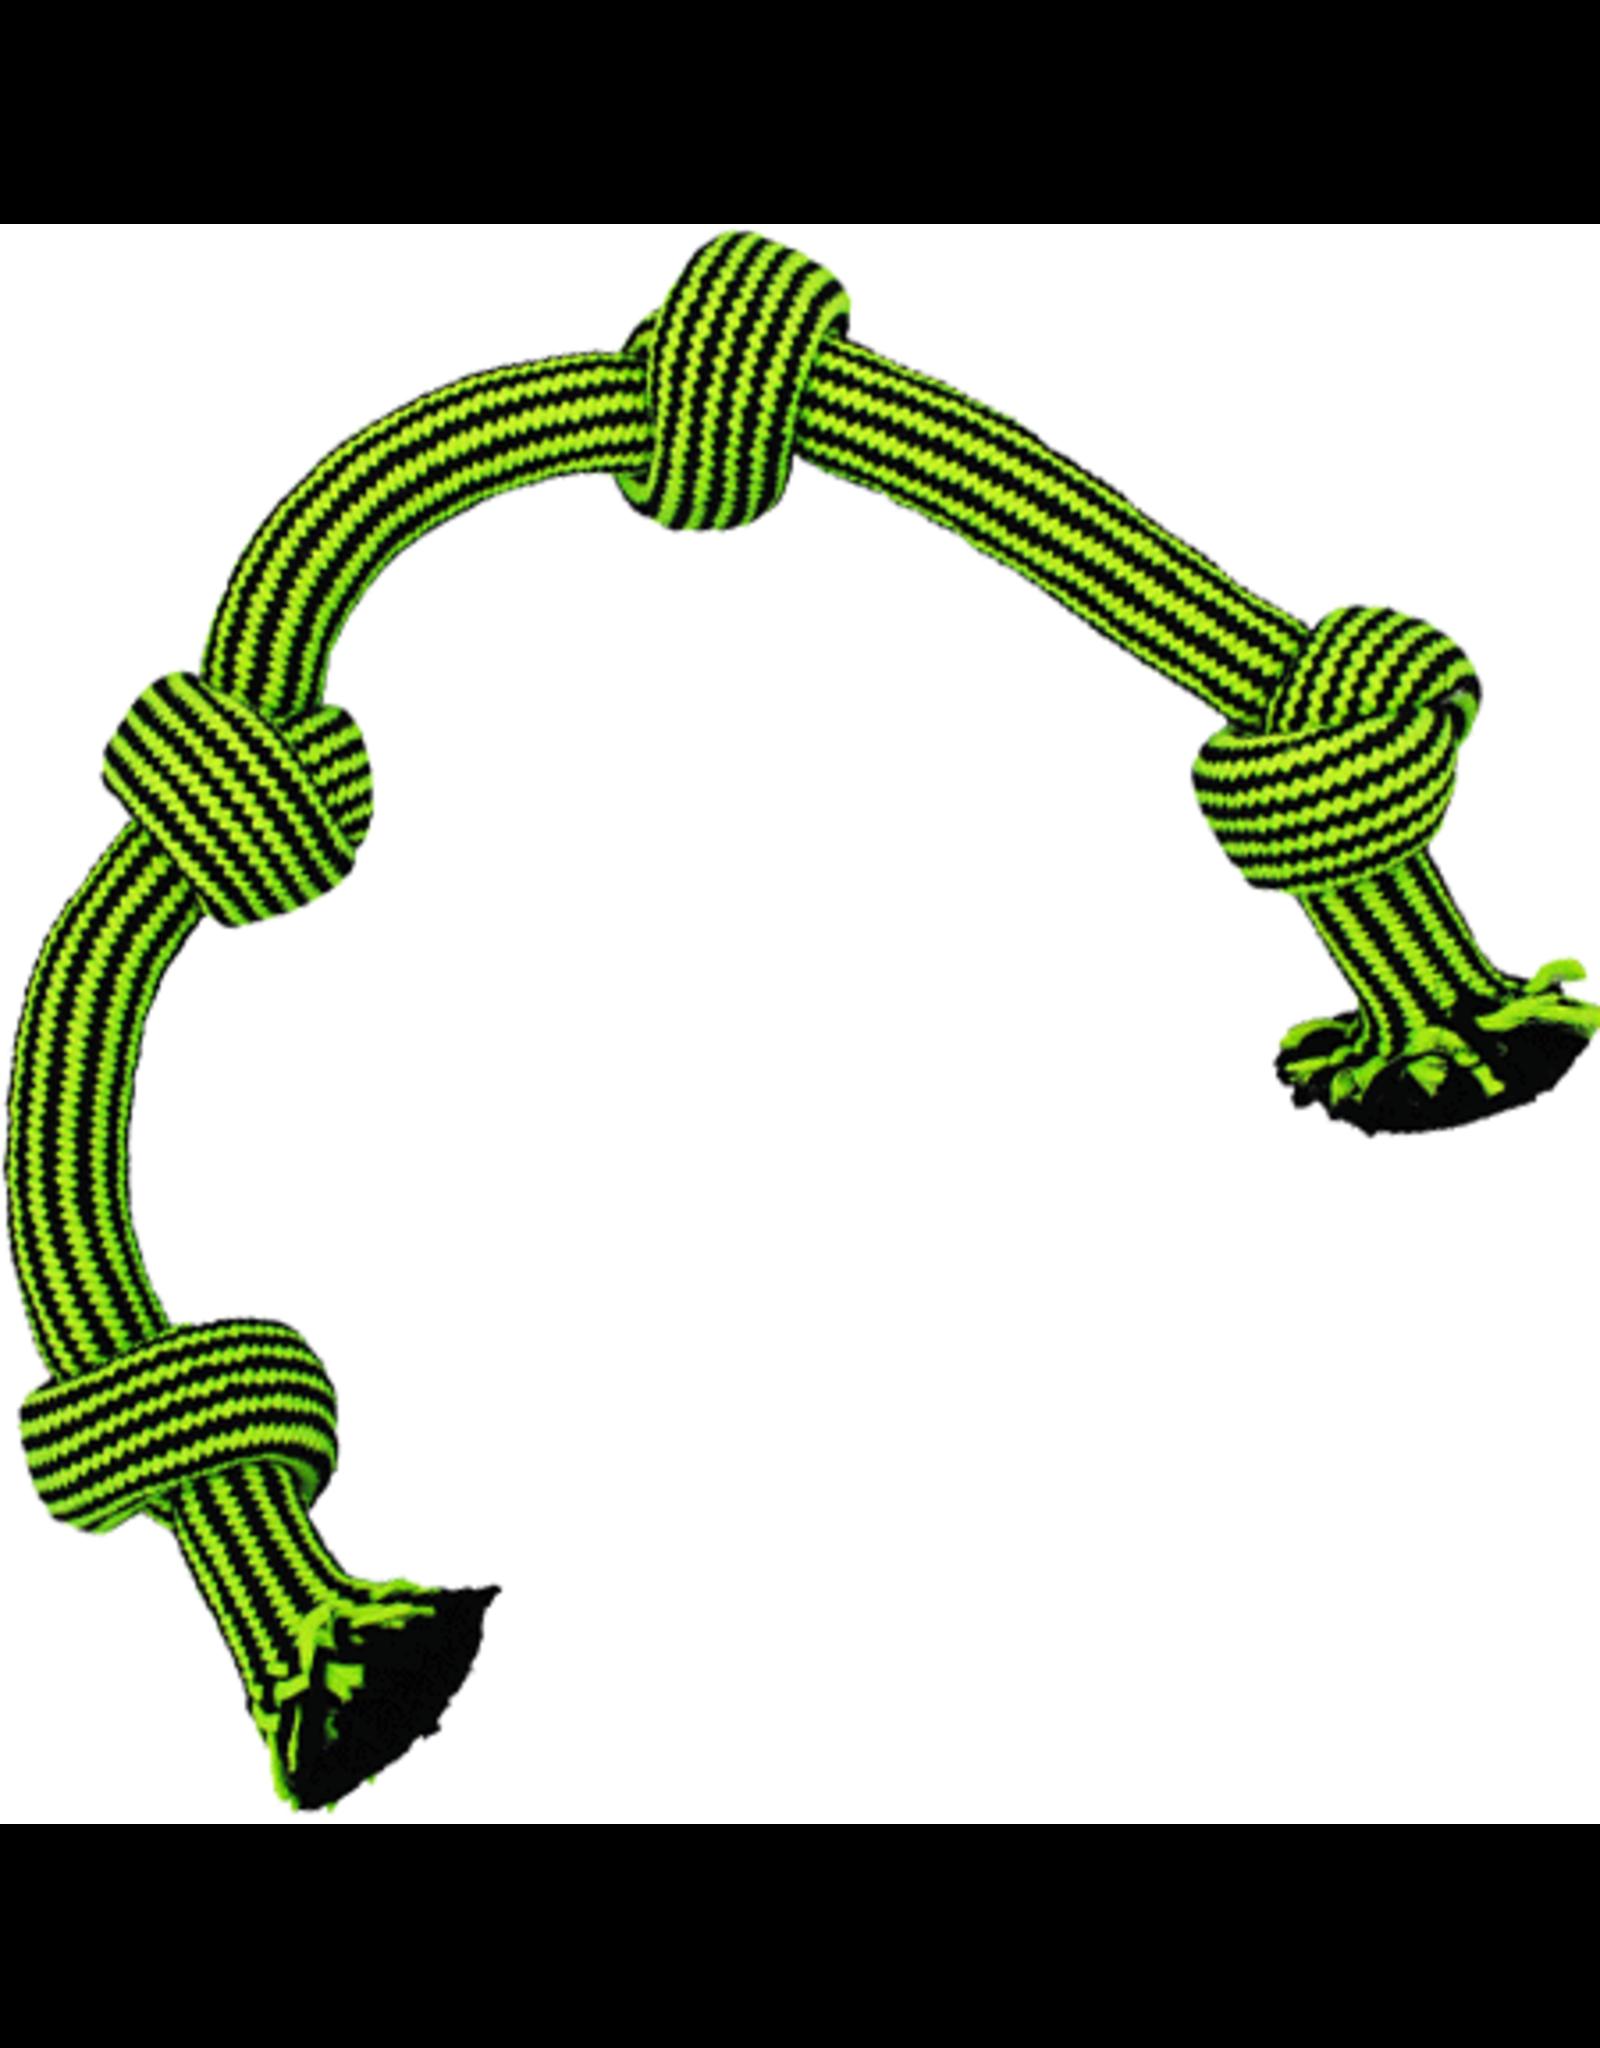 Jolly Pet JOLLYPET Knot-n-Chew L/XL 4 Knot